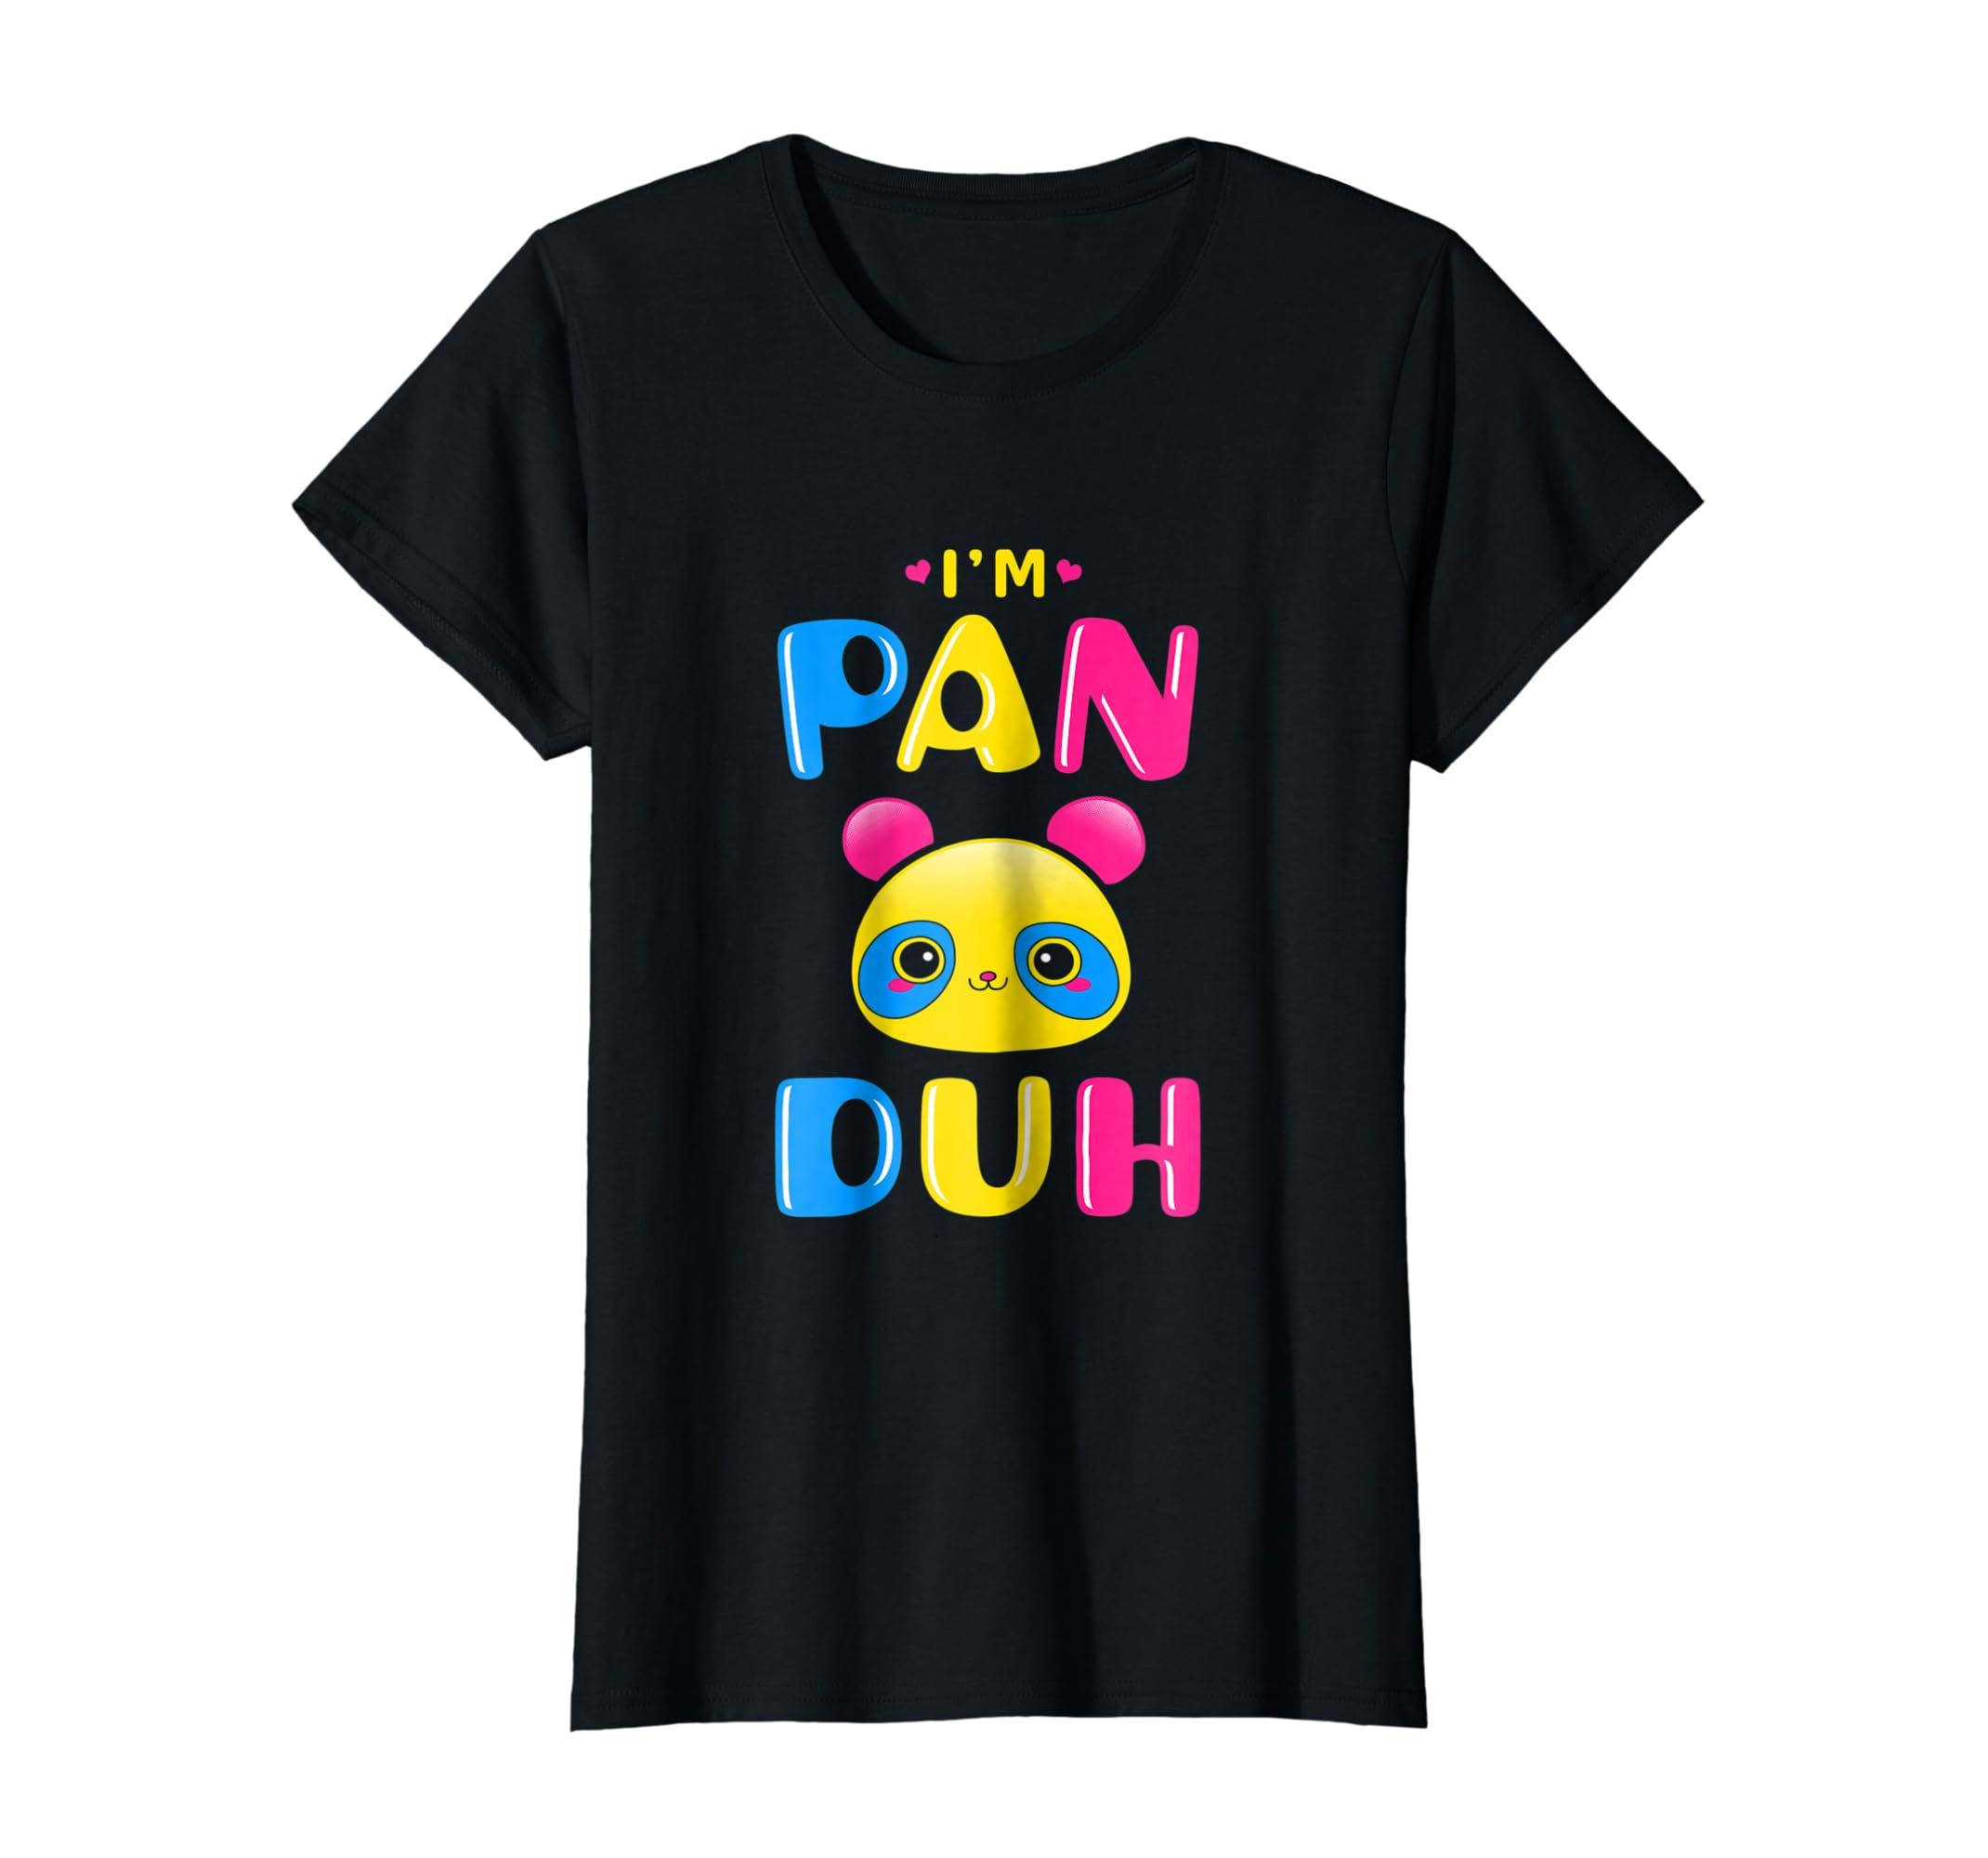 a3eb6e8a286df9 Amazon.com  Pansexual Shirt Funny Gay Pride LGBT I m Pan Duh Panda  Clothing